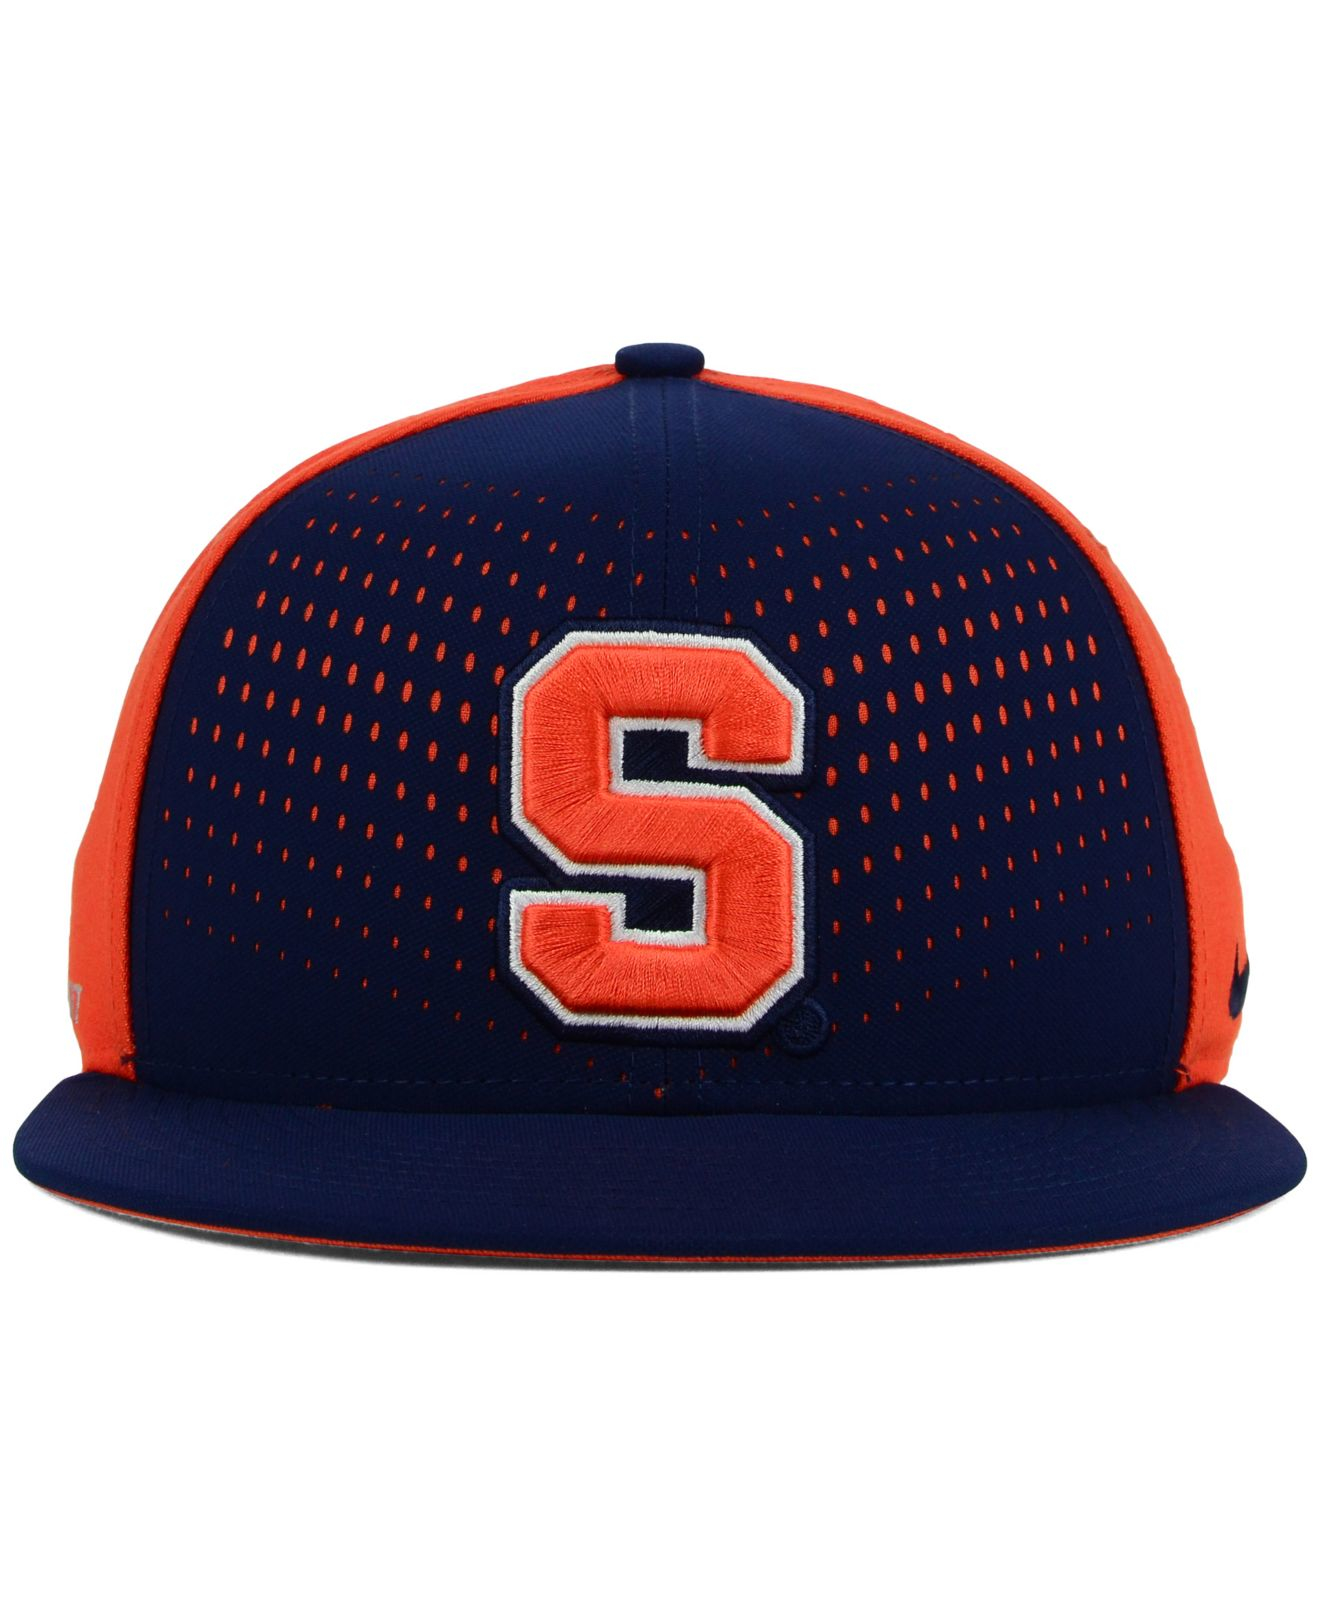 5de3b87c3c4b5 norway nike syracuse dri fit hat 3bc3d ee0e7  switzerland lyst nike  syracuse orange true seasonal snapback cap in blue for men da8c2 e1d6a